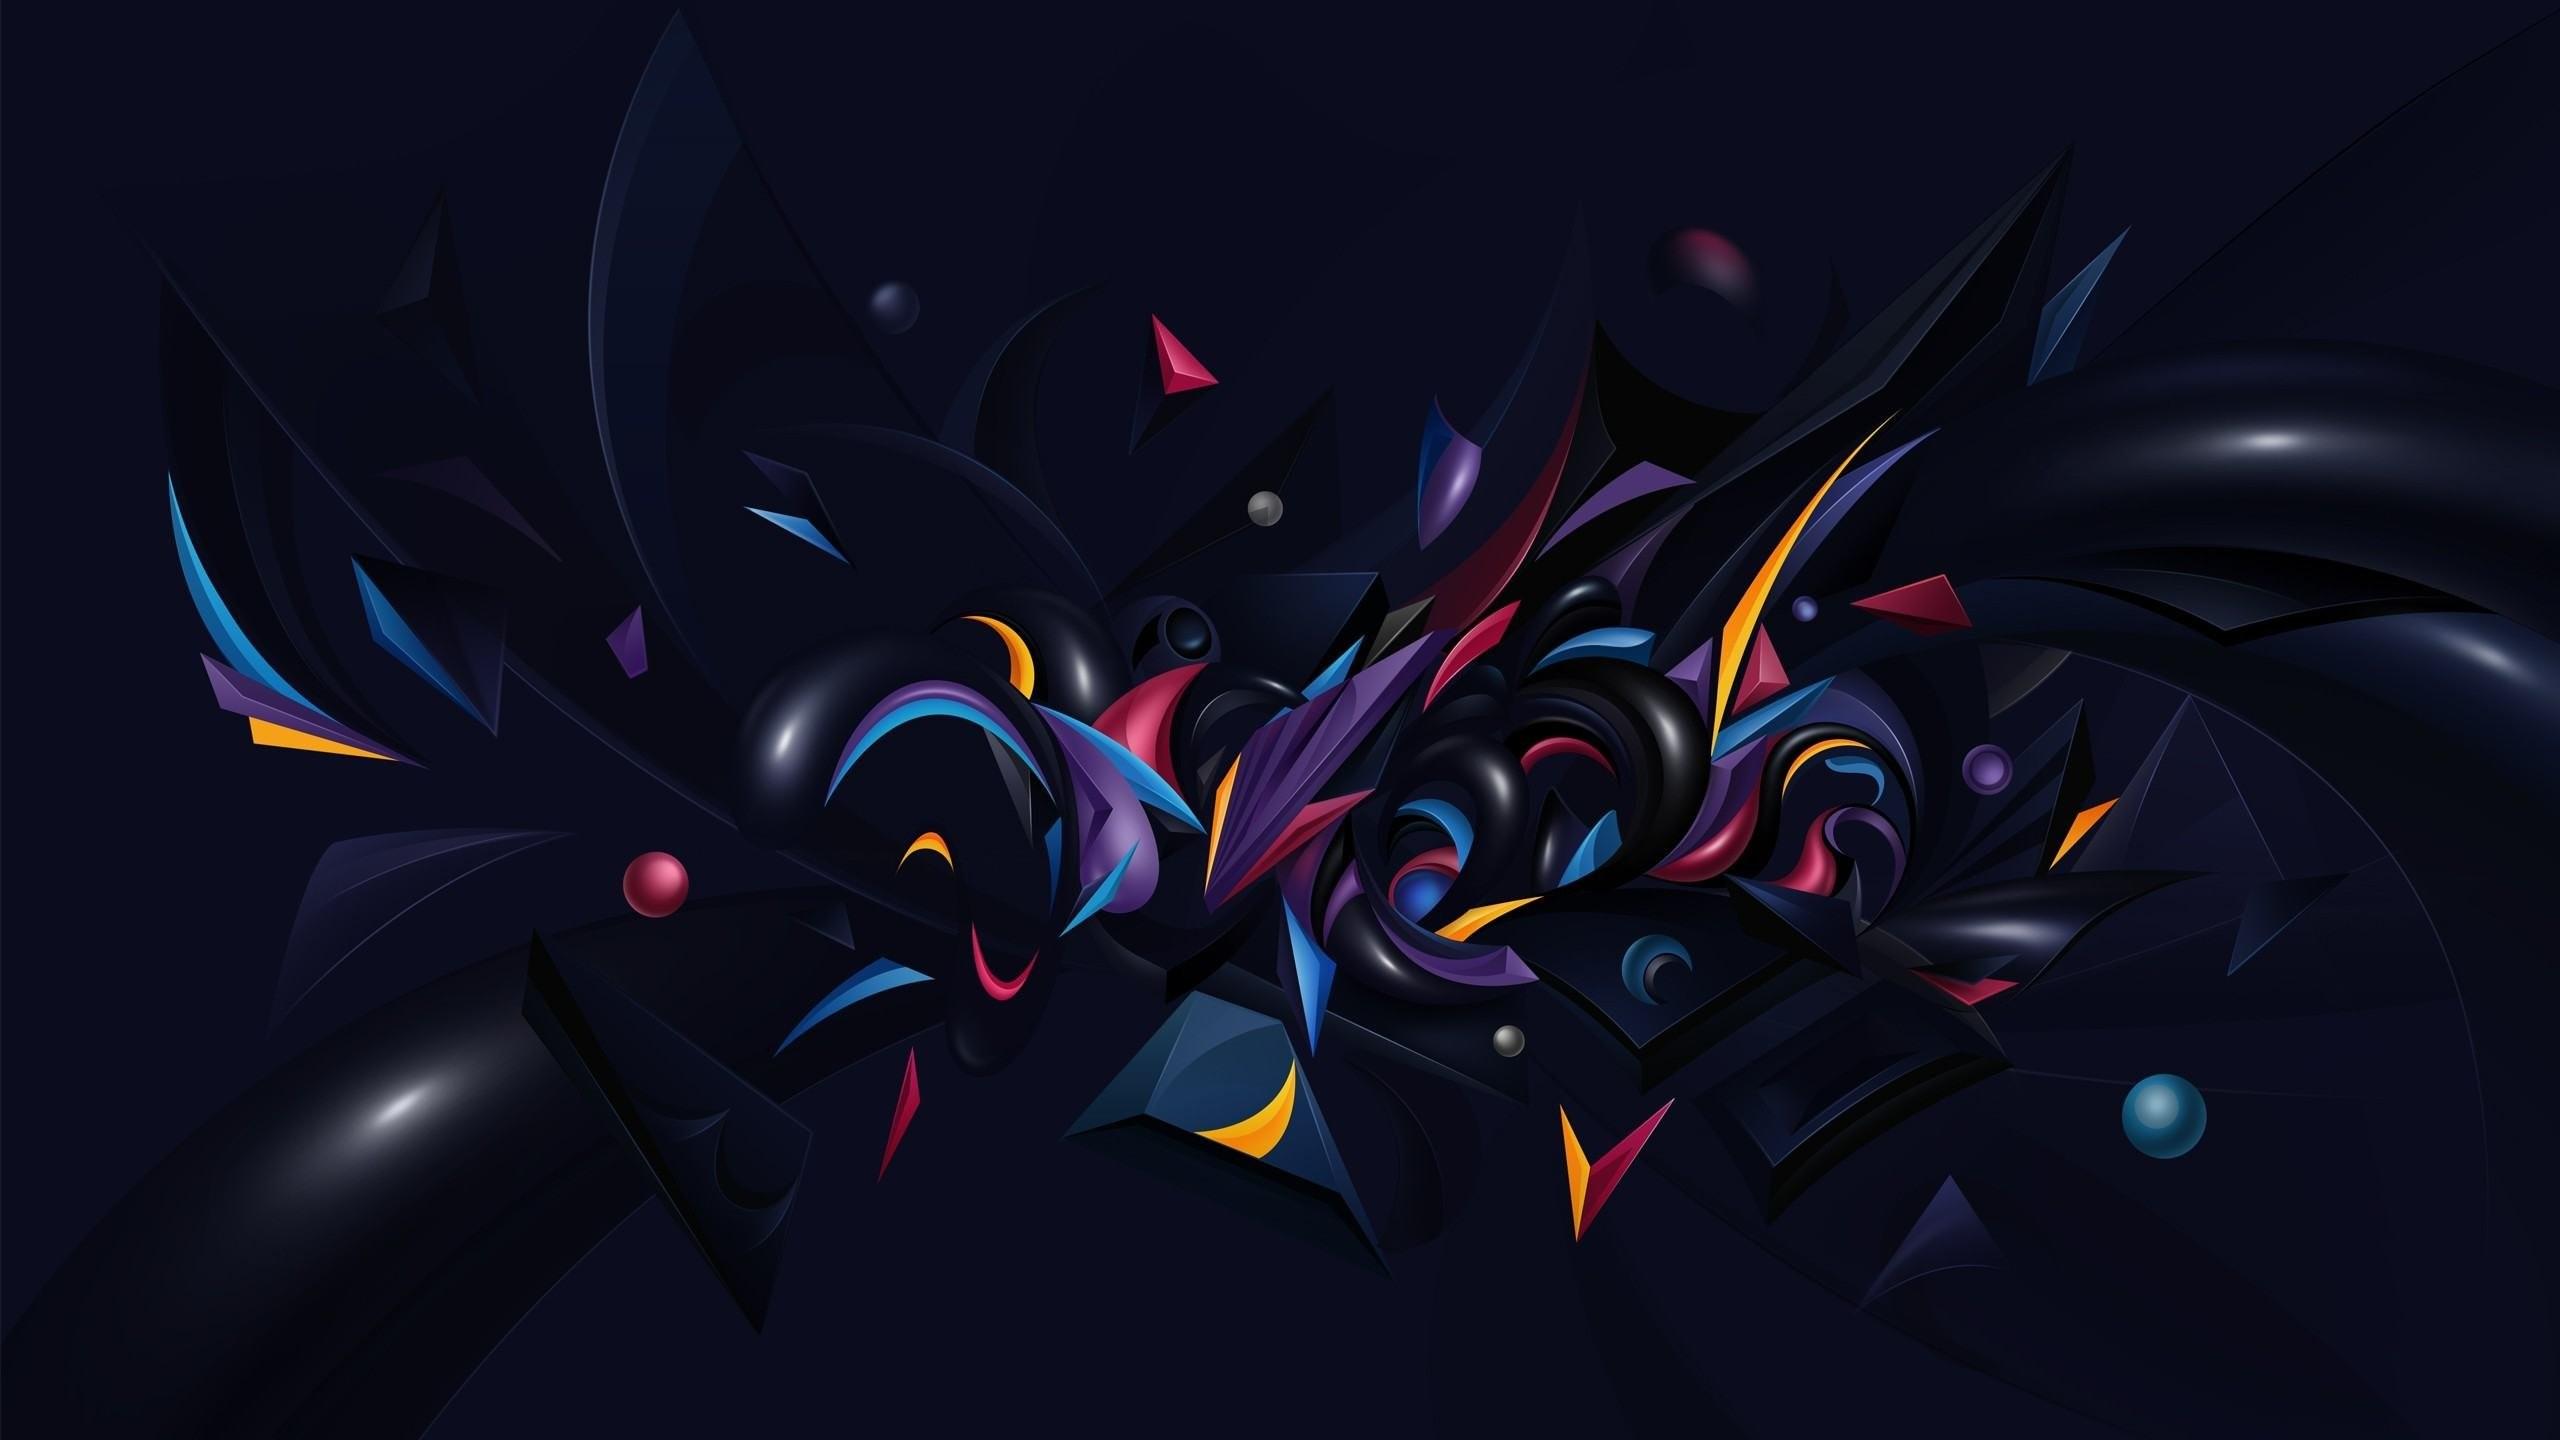 Wallpapers Smoke Black Latest